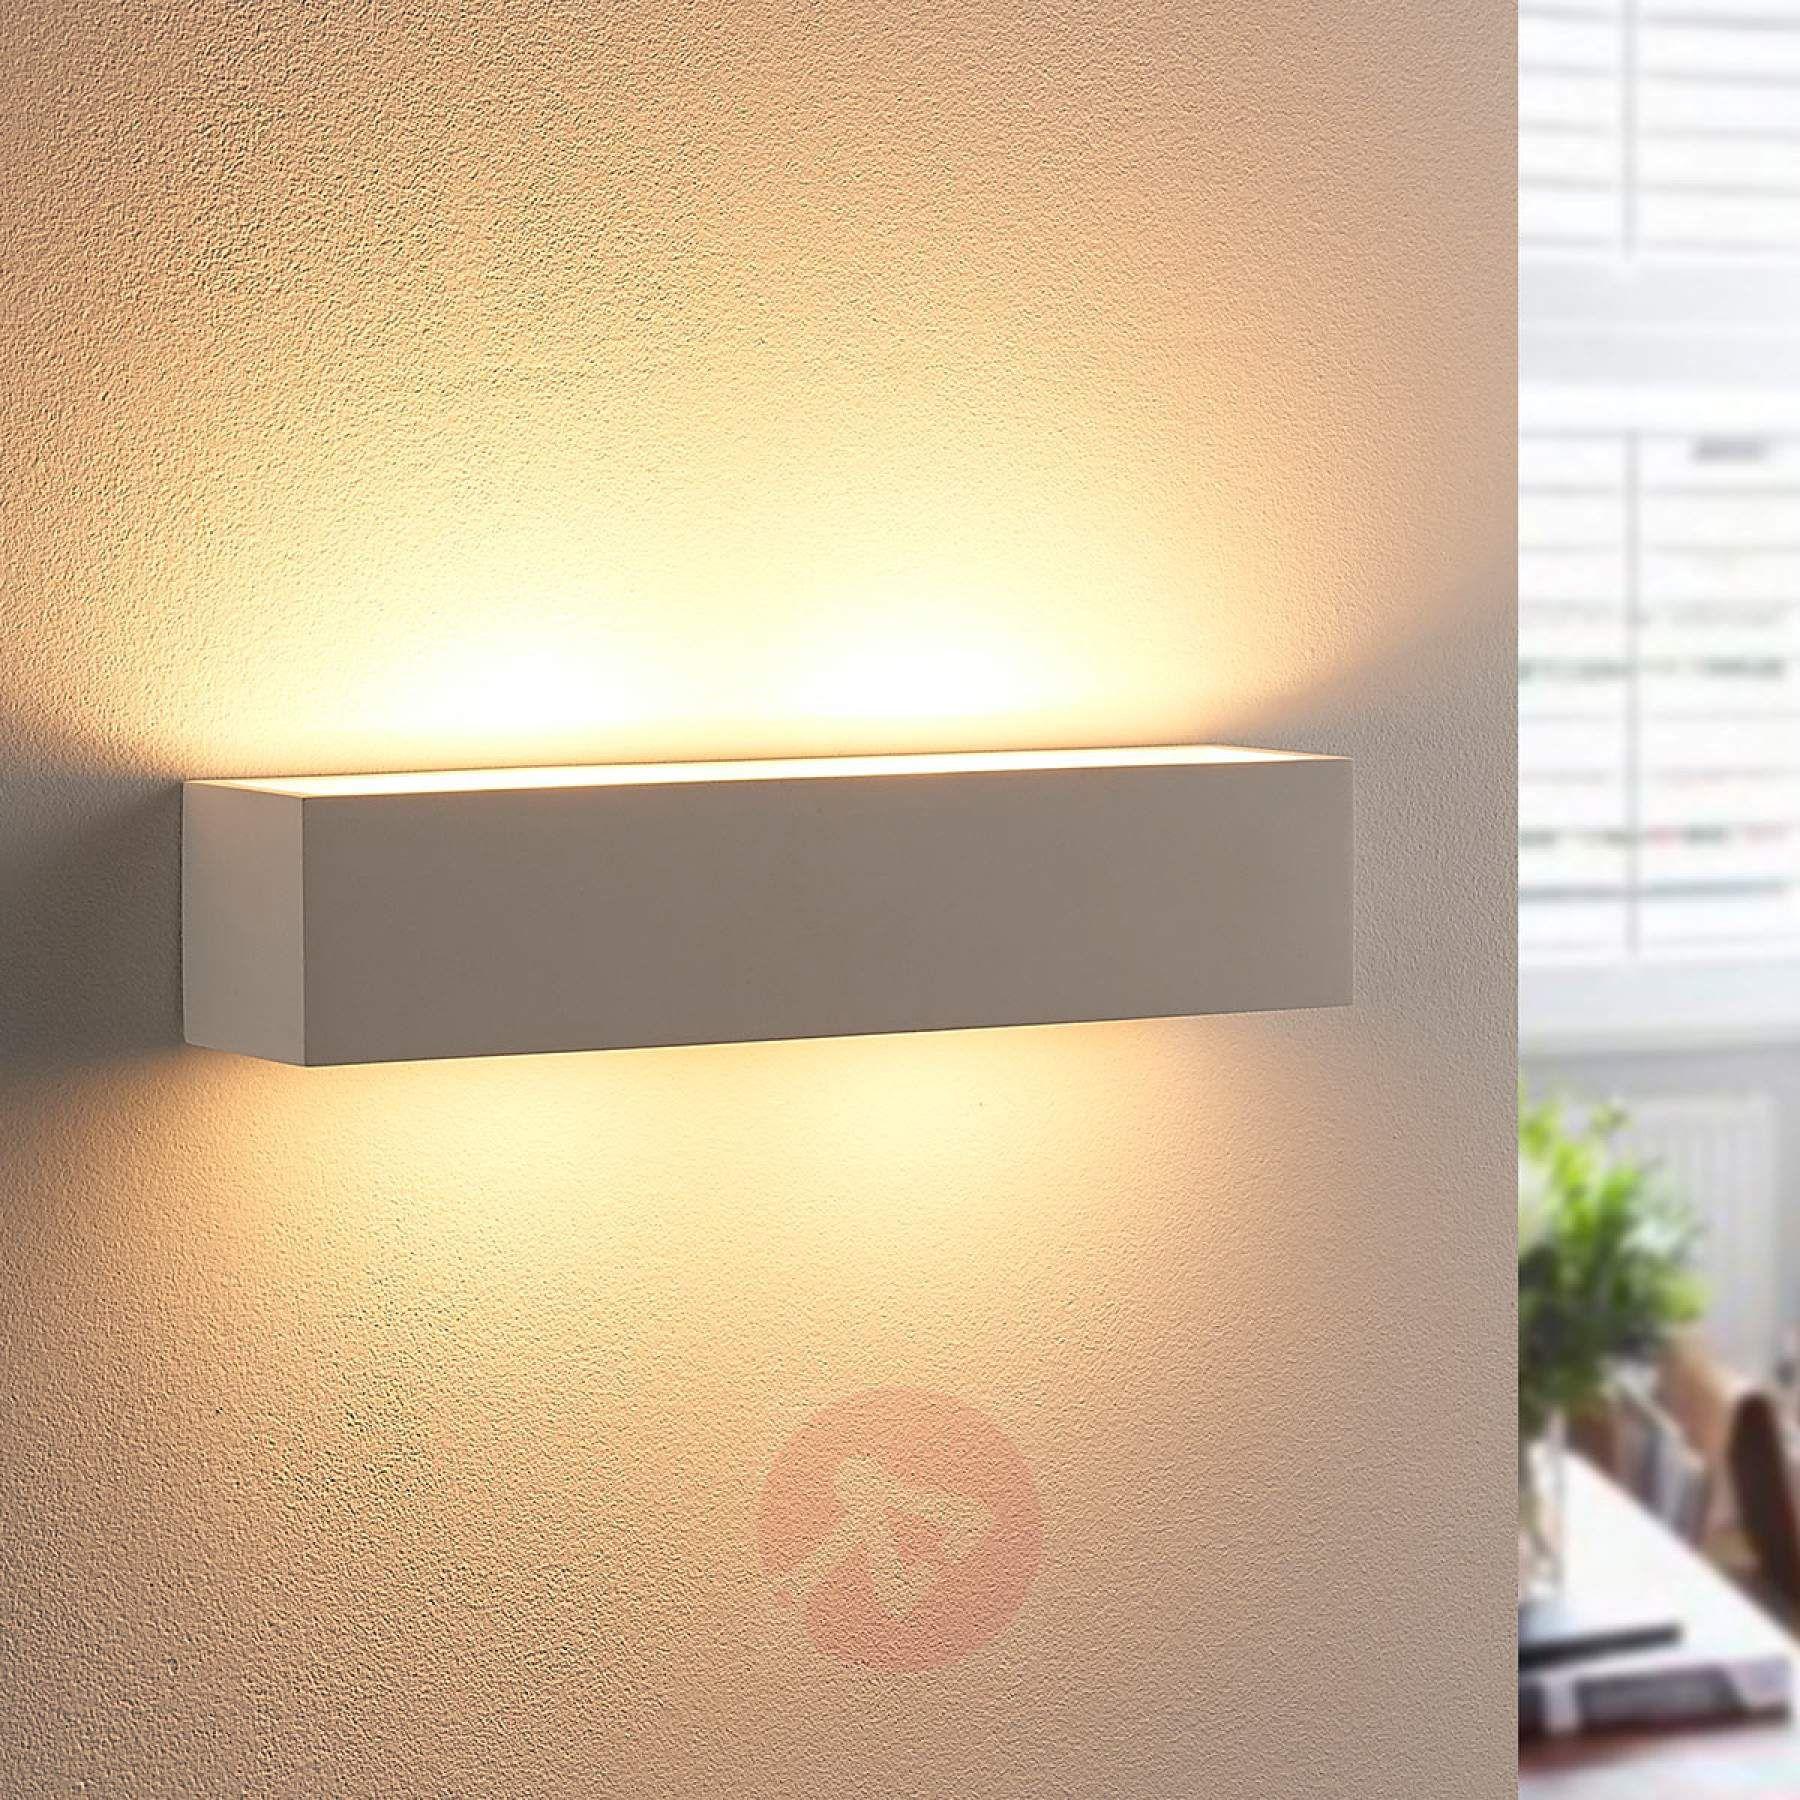 Gipswandleuchte Tjada Mit G9 Led Lampen Led Lampe Lampen Led